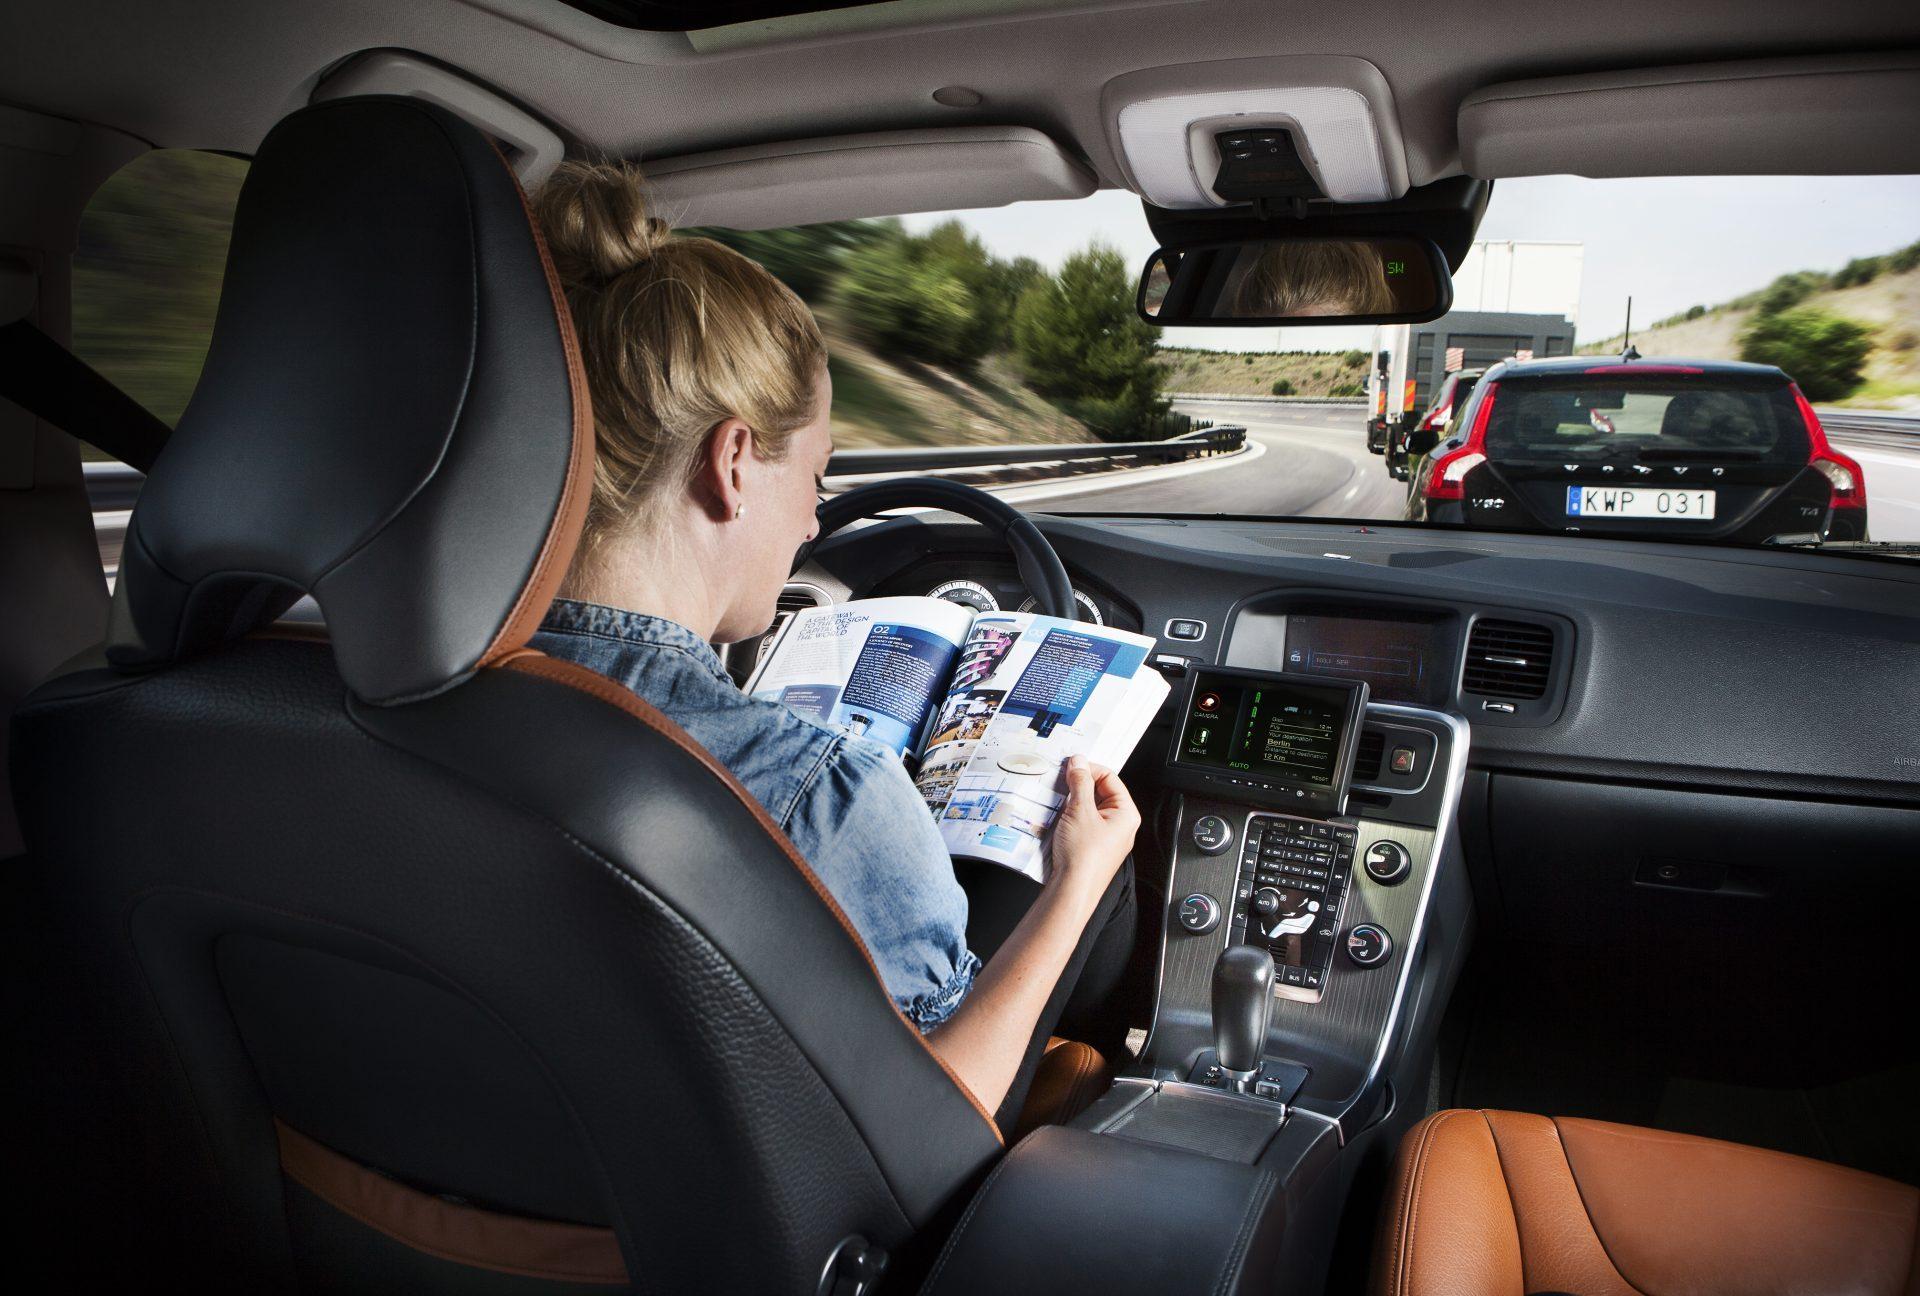 Engenharia Automotiva: o desafio dos veículos autônomos